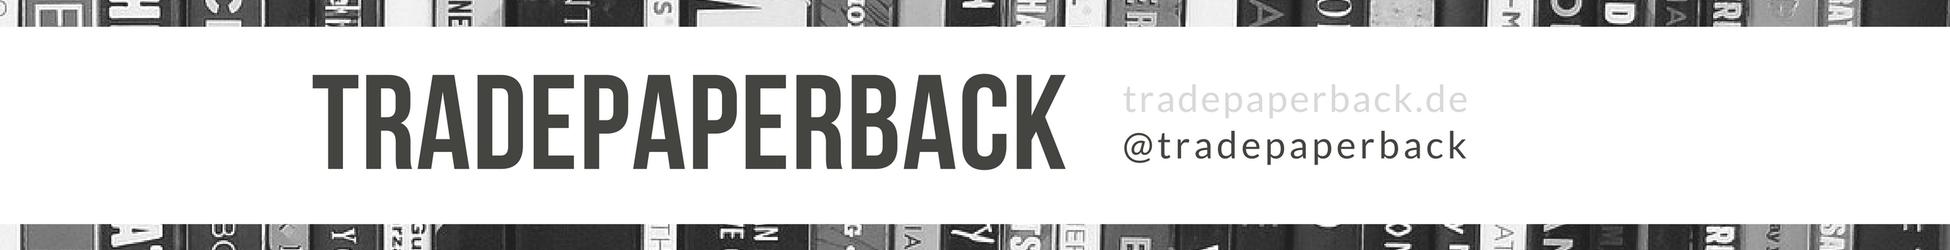 tradepaperback